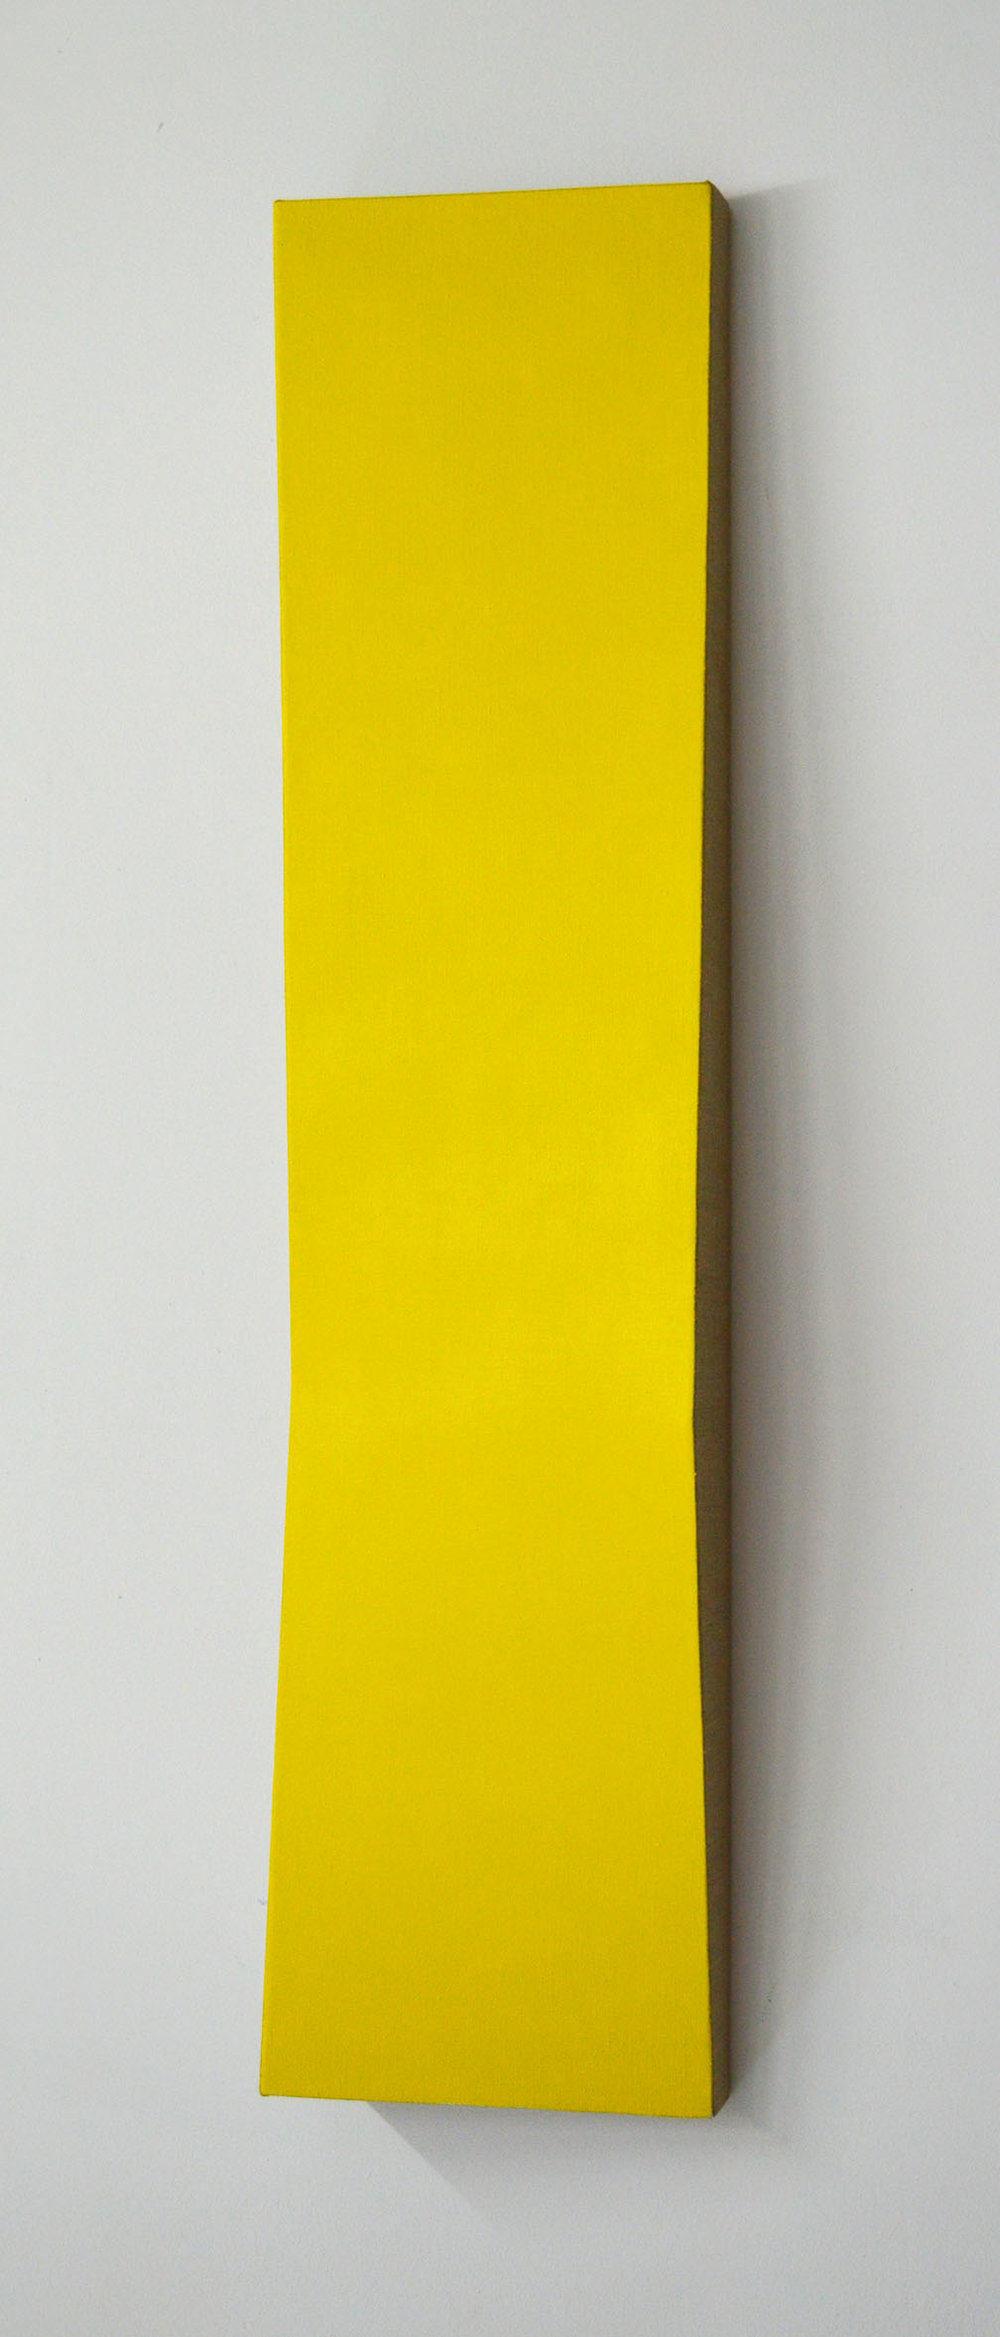 Untitled (855)